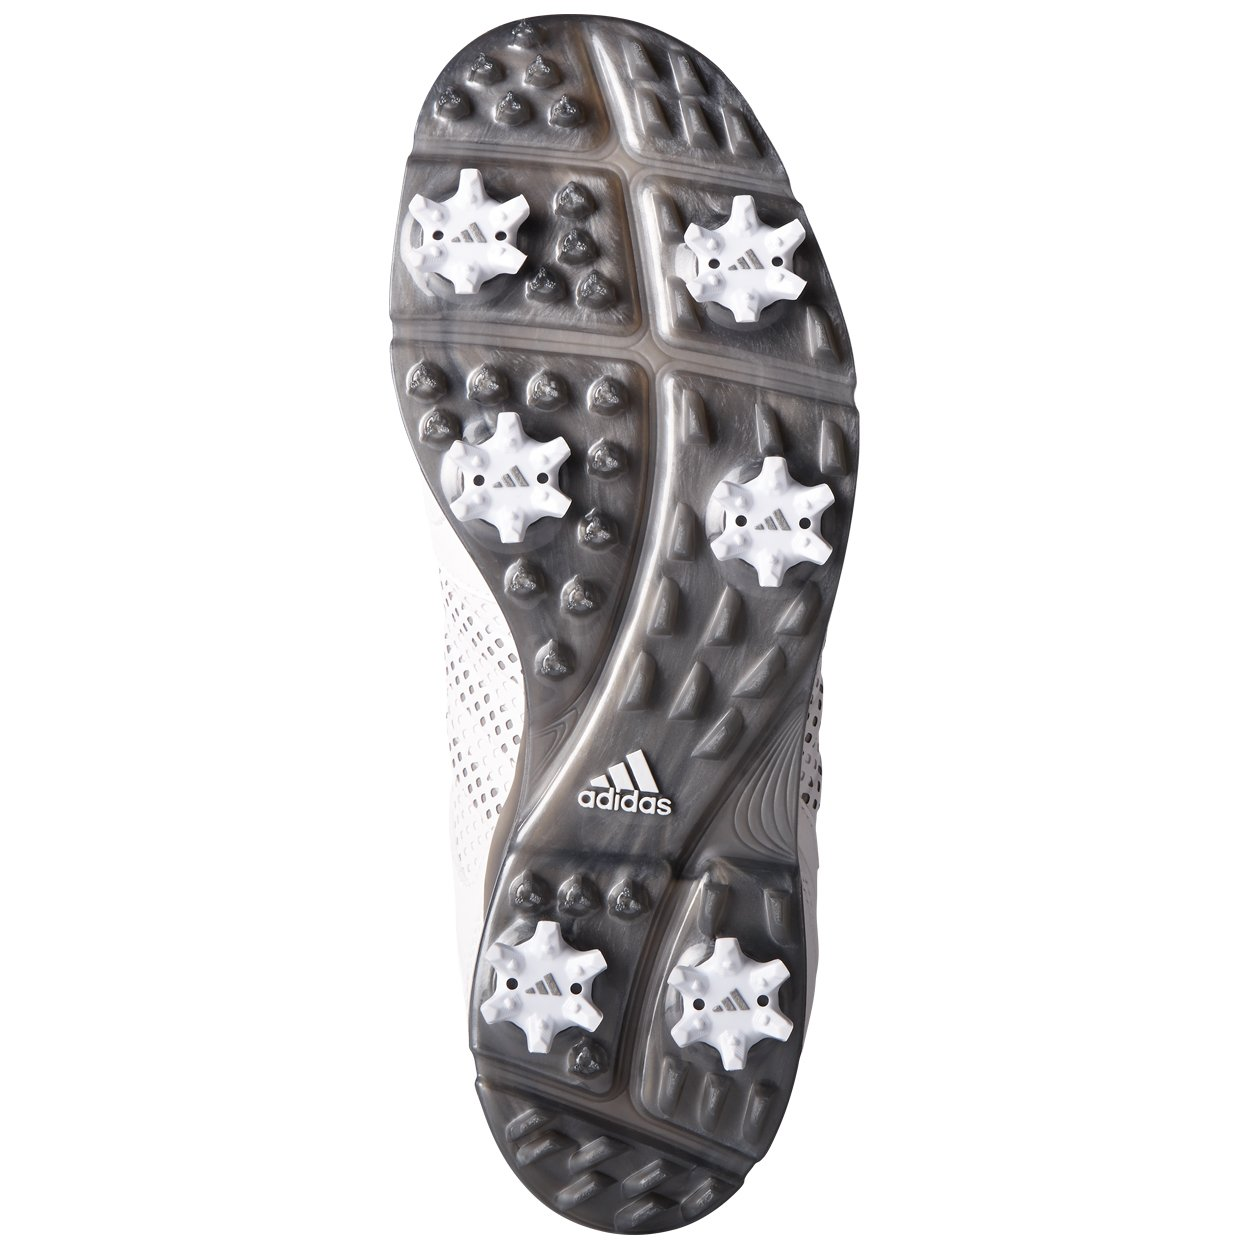 adidas Women's Adipure Tour Golf Shoe, White, 9.5 M US by adidas (Image #2)